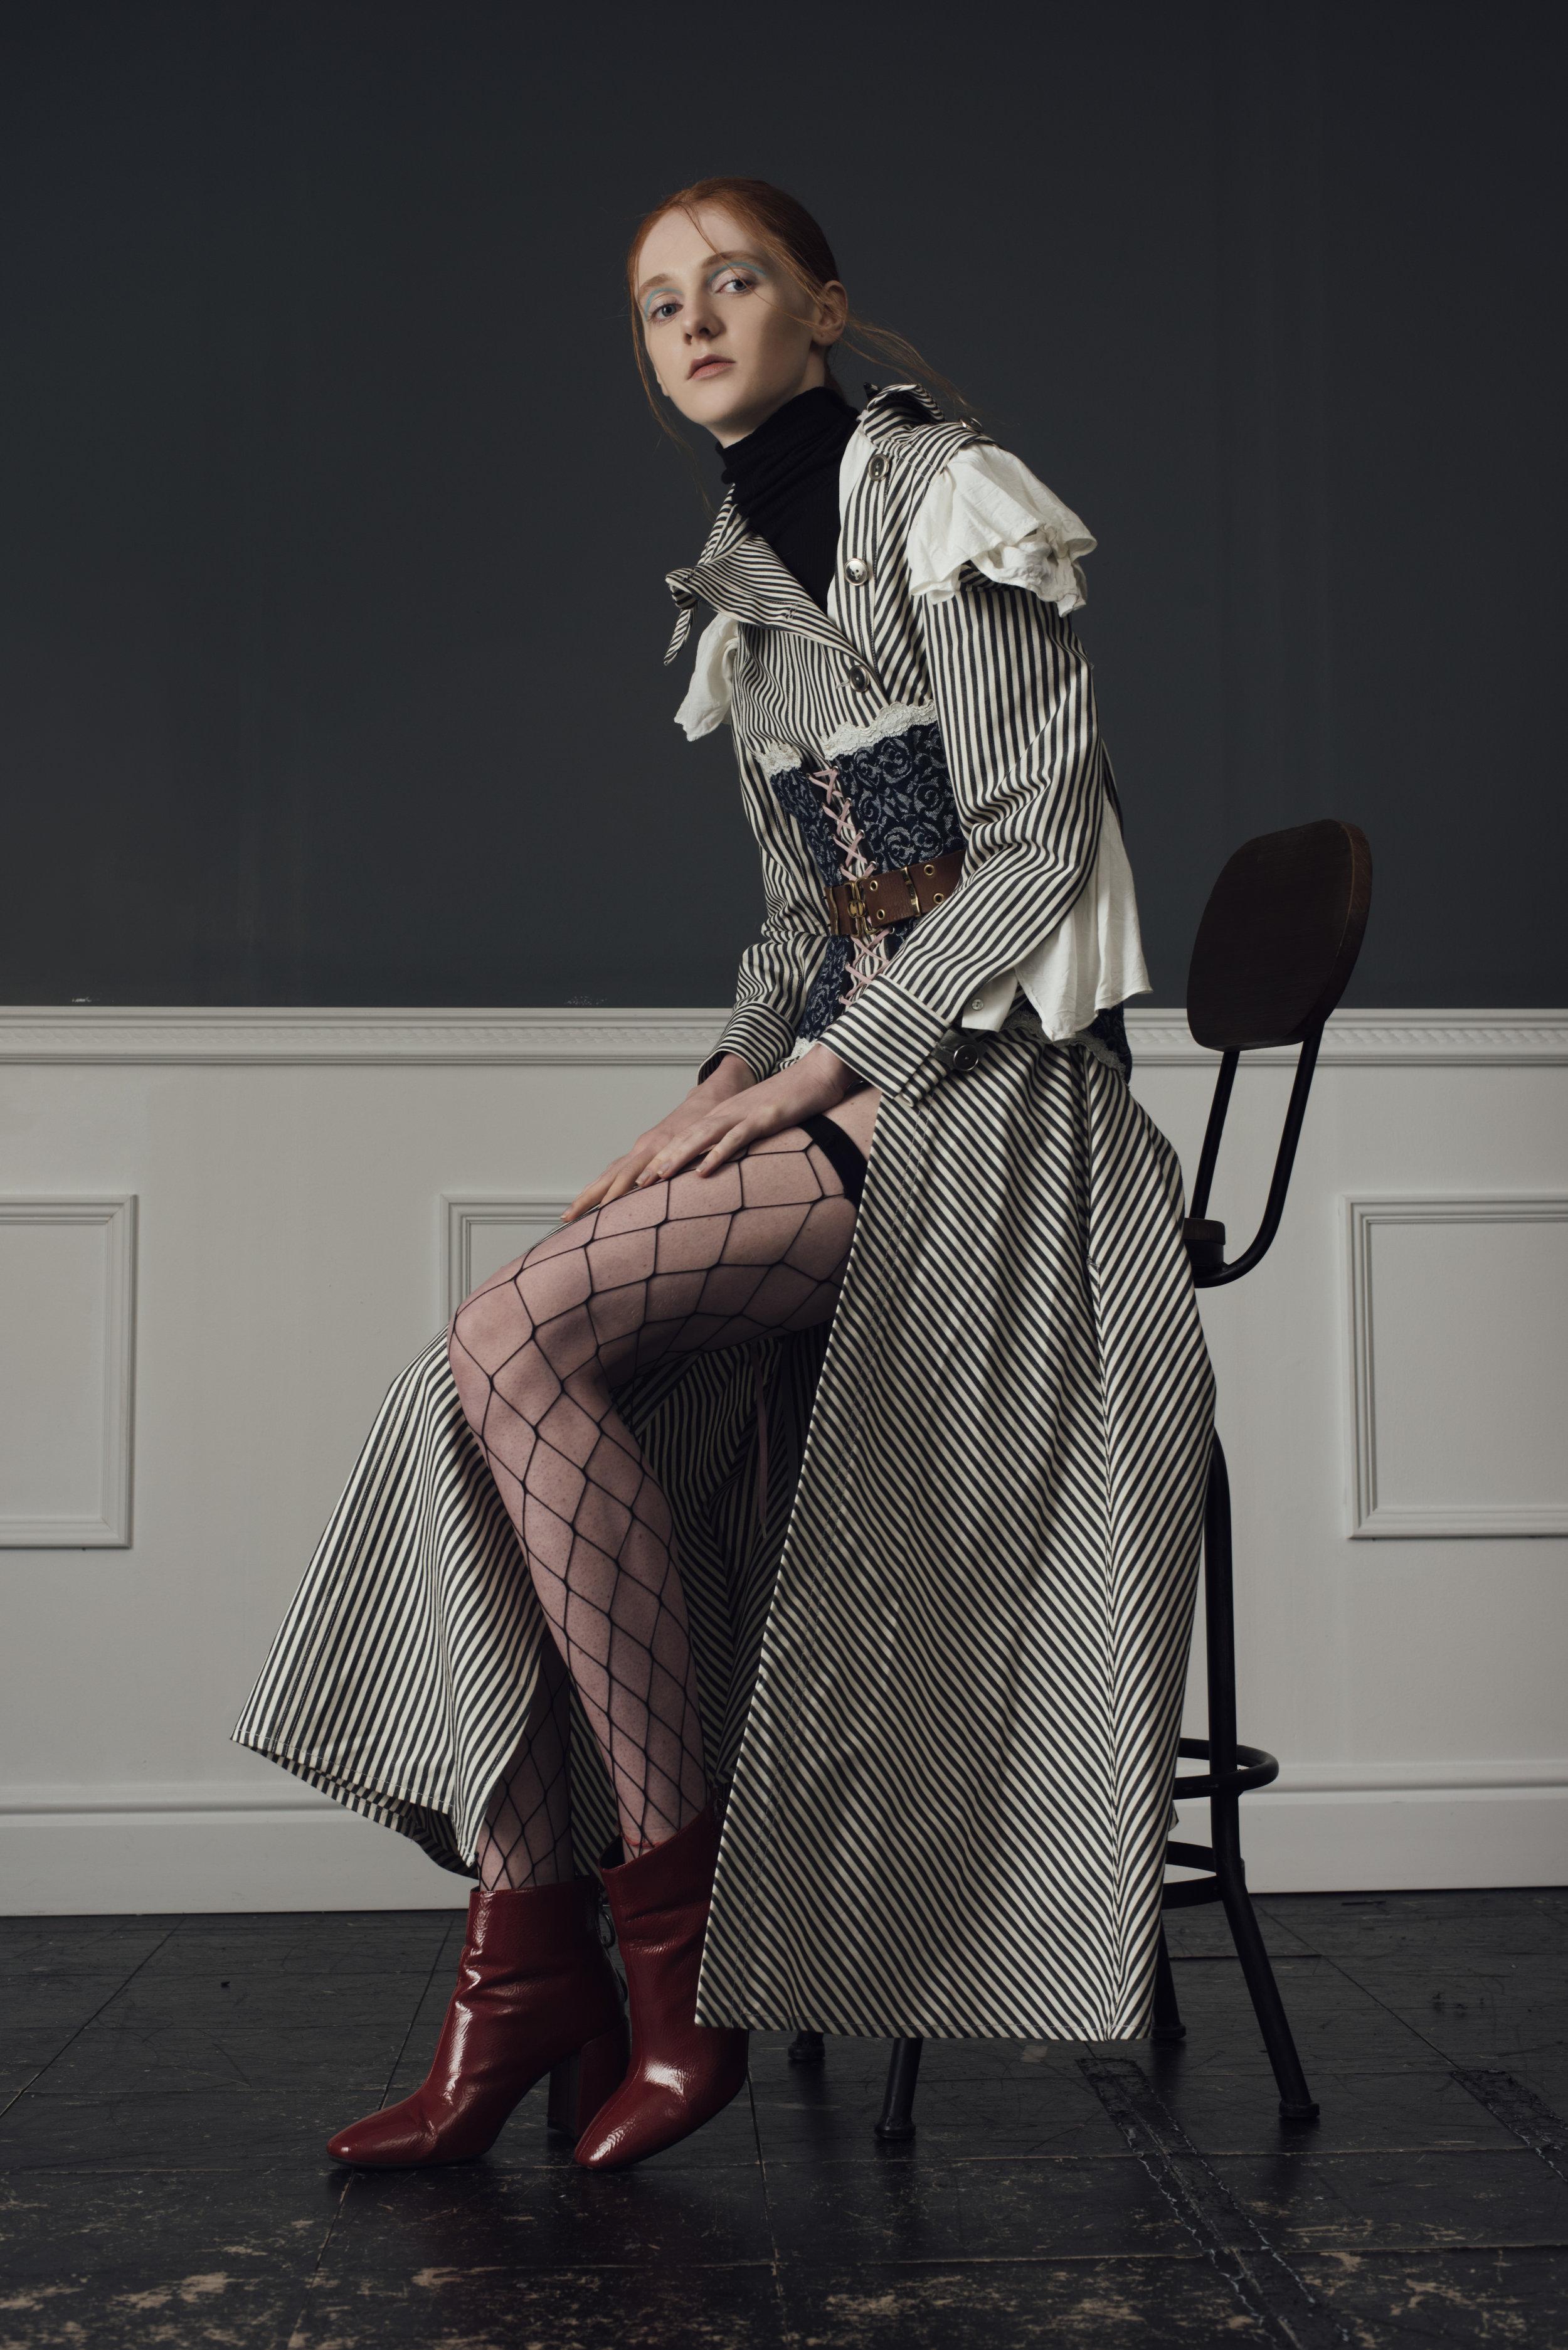 jumper  UNIQLO , blouse STYLIST'S OWN, corset COSTUME STUDIO Vintage dior belt MODES AND MORE,coat  CONSTANCE BLACKBALLER , boots STYLIST'S OWN